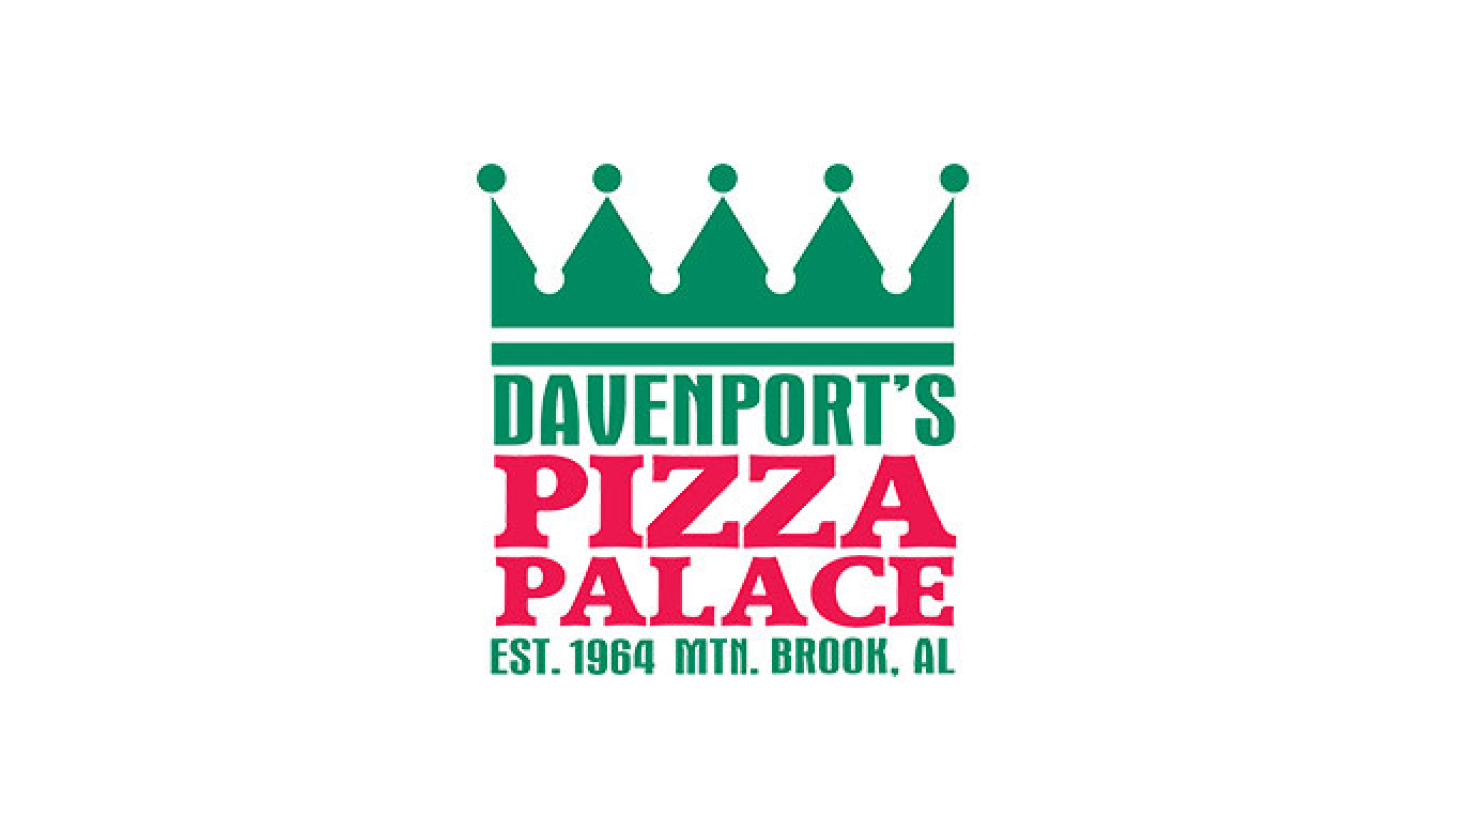 Davenport's Pizza Palace 001.png